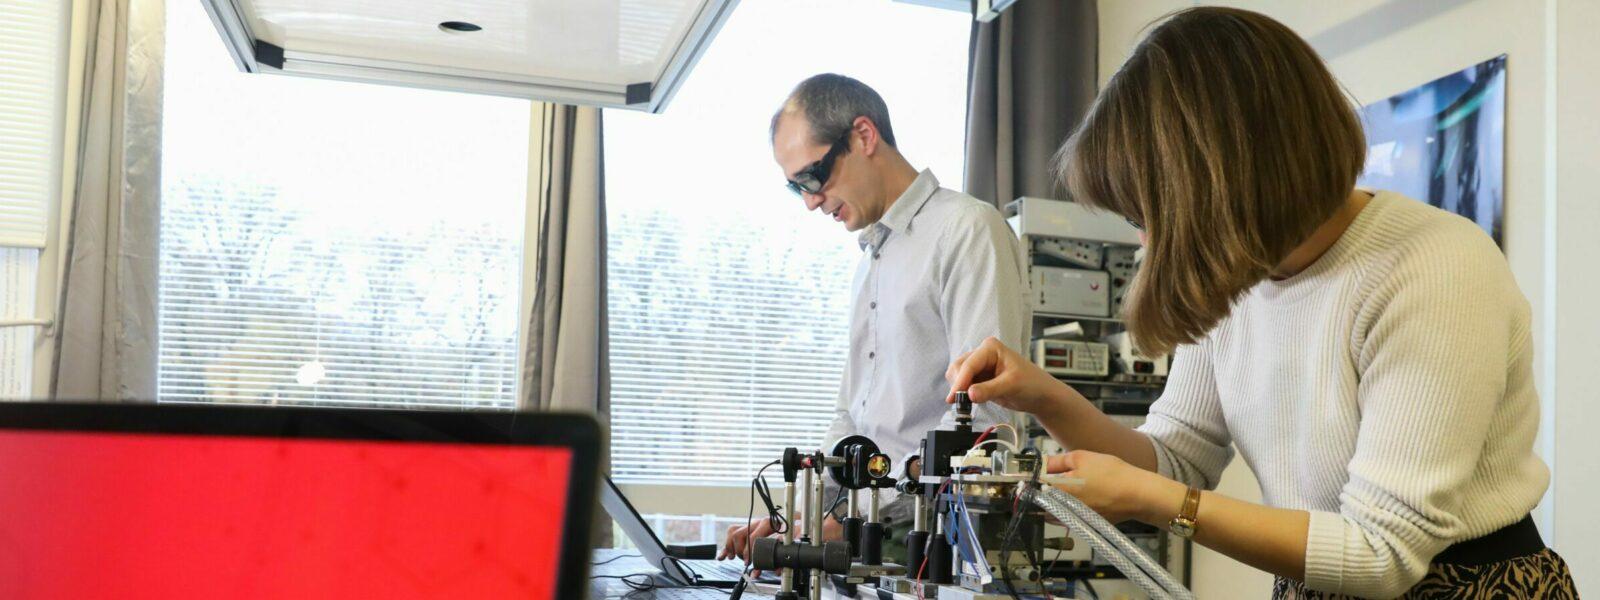 Mirsense's team at work on laser